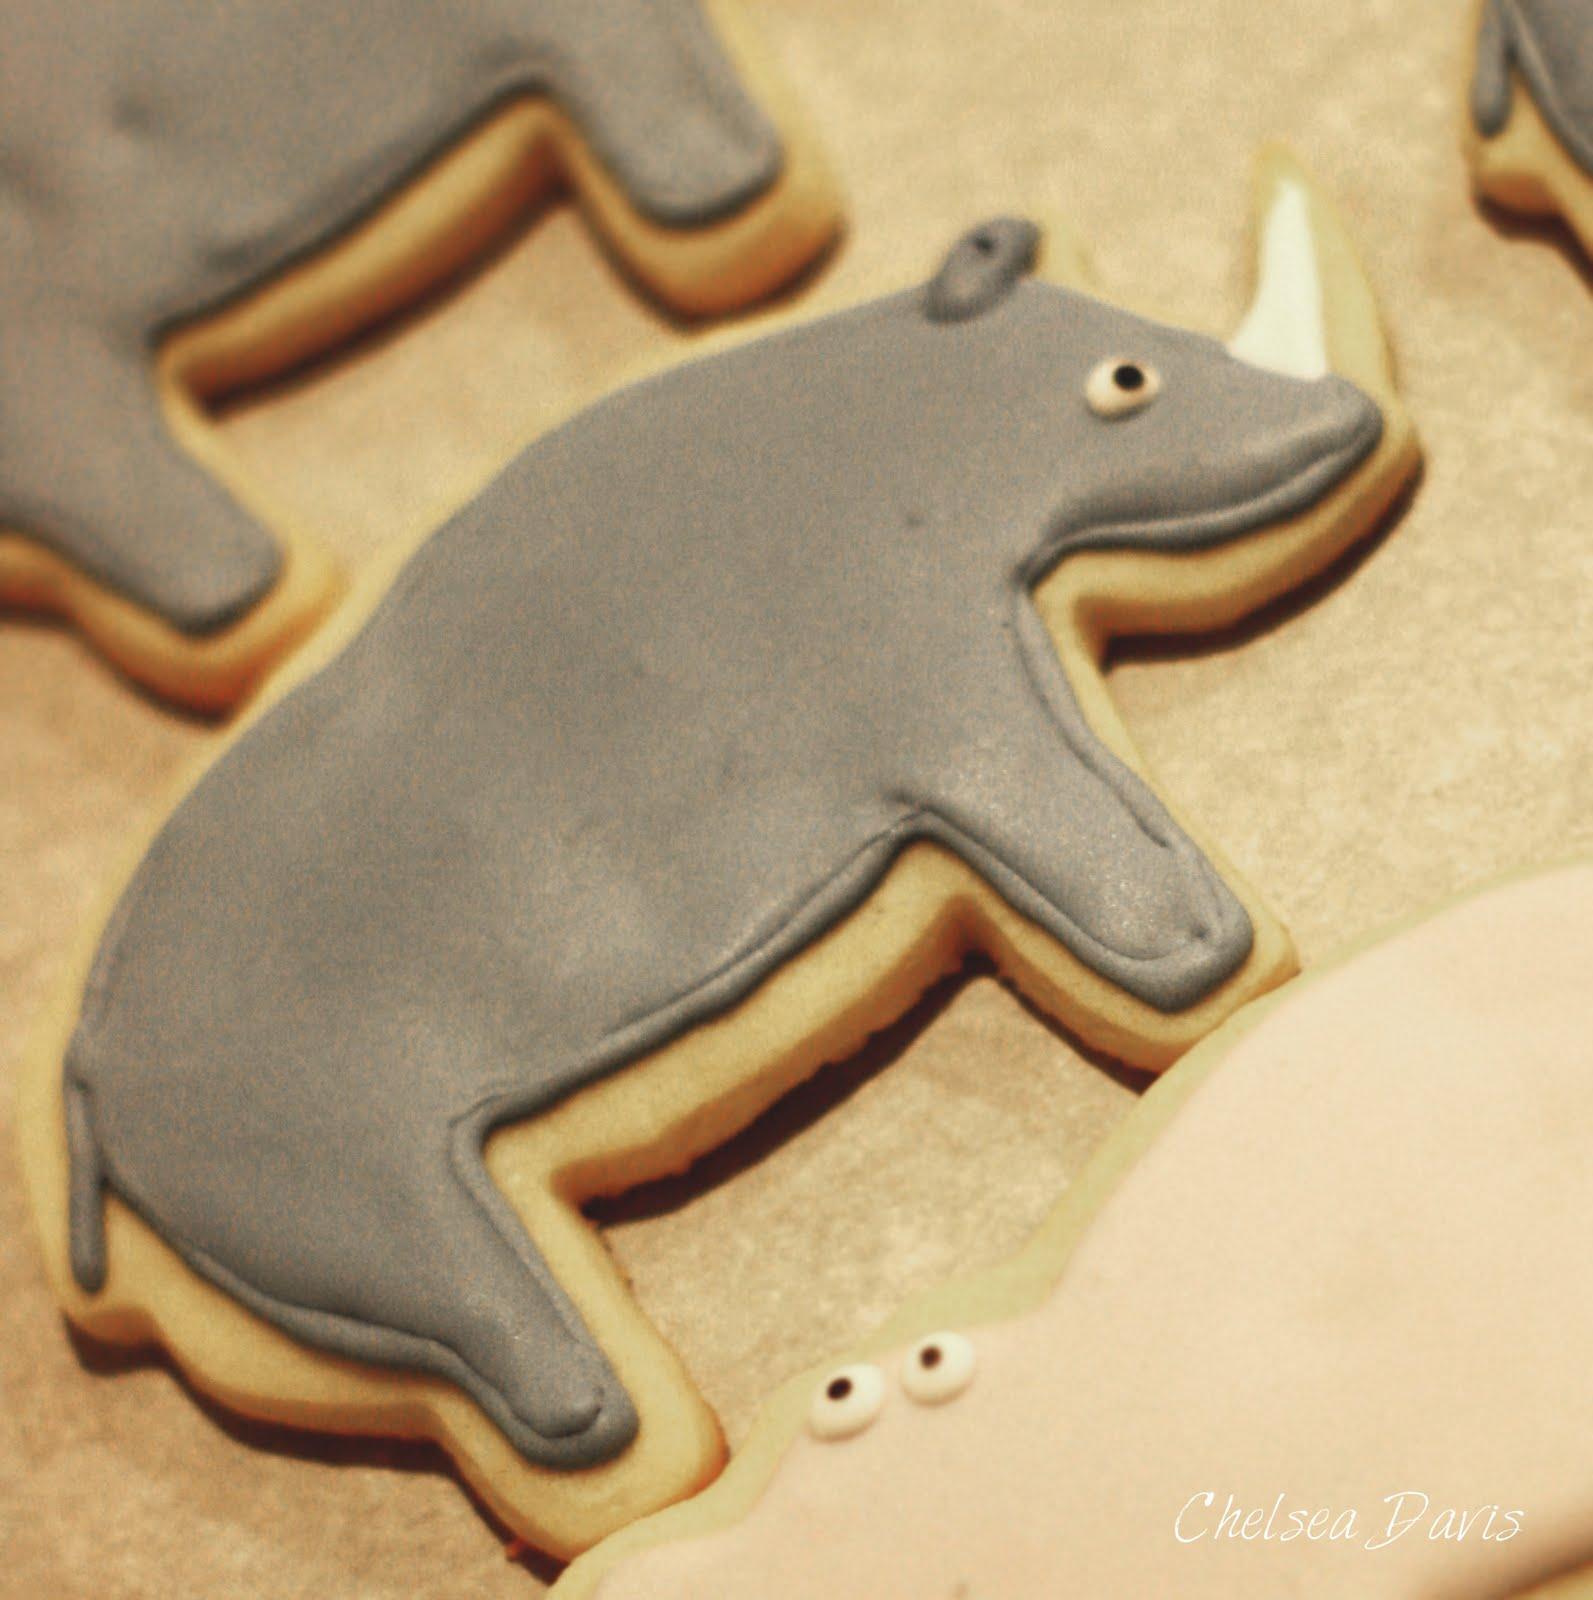 http://1.bp.blogspot.com/_qCyFjLgbMHE/S8Uq8hTbStI/AAAAAAAAARI/nEcqDIm8xQw/s1600/Elephant.jpg